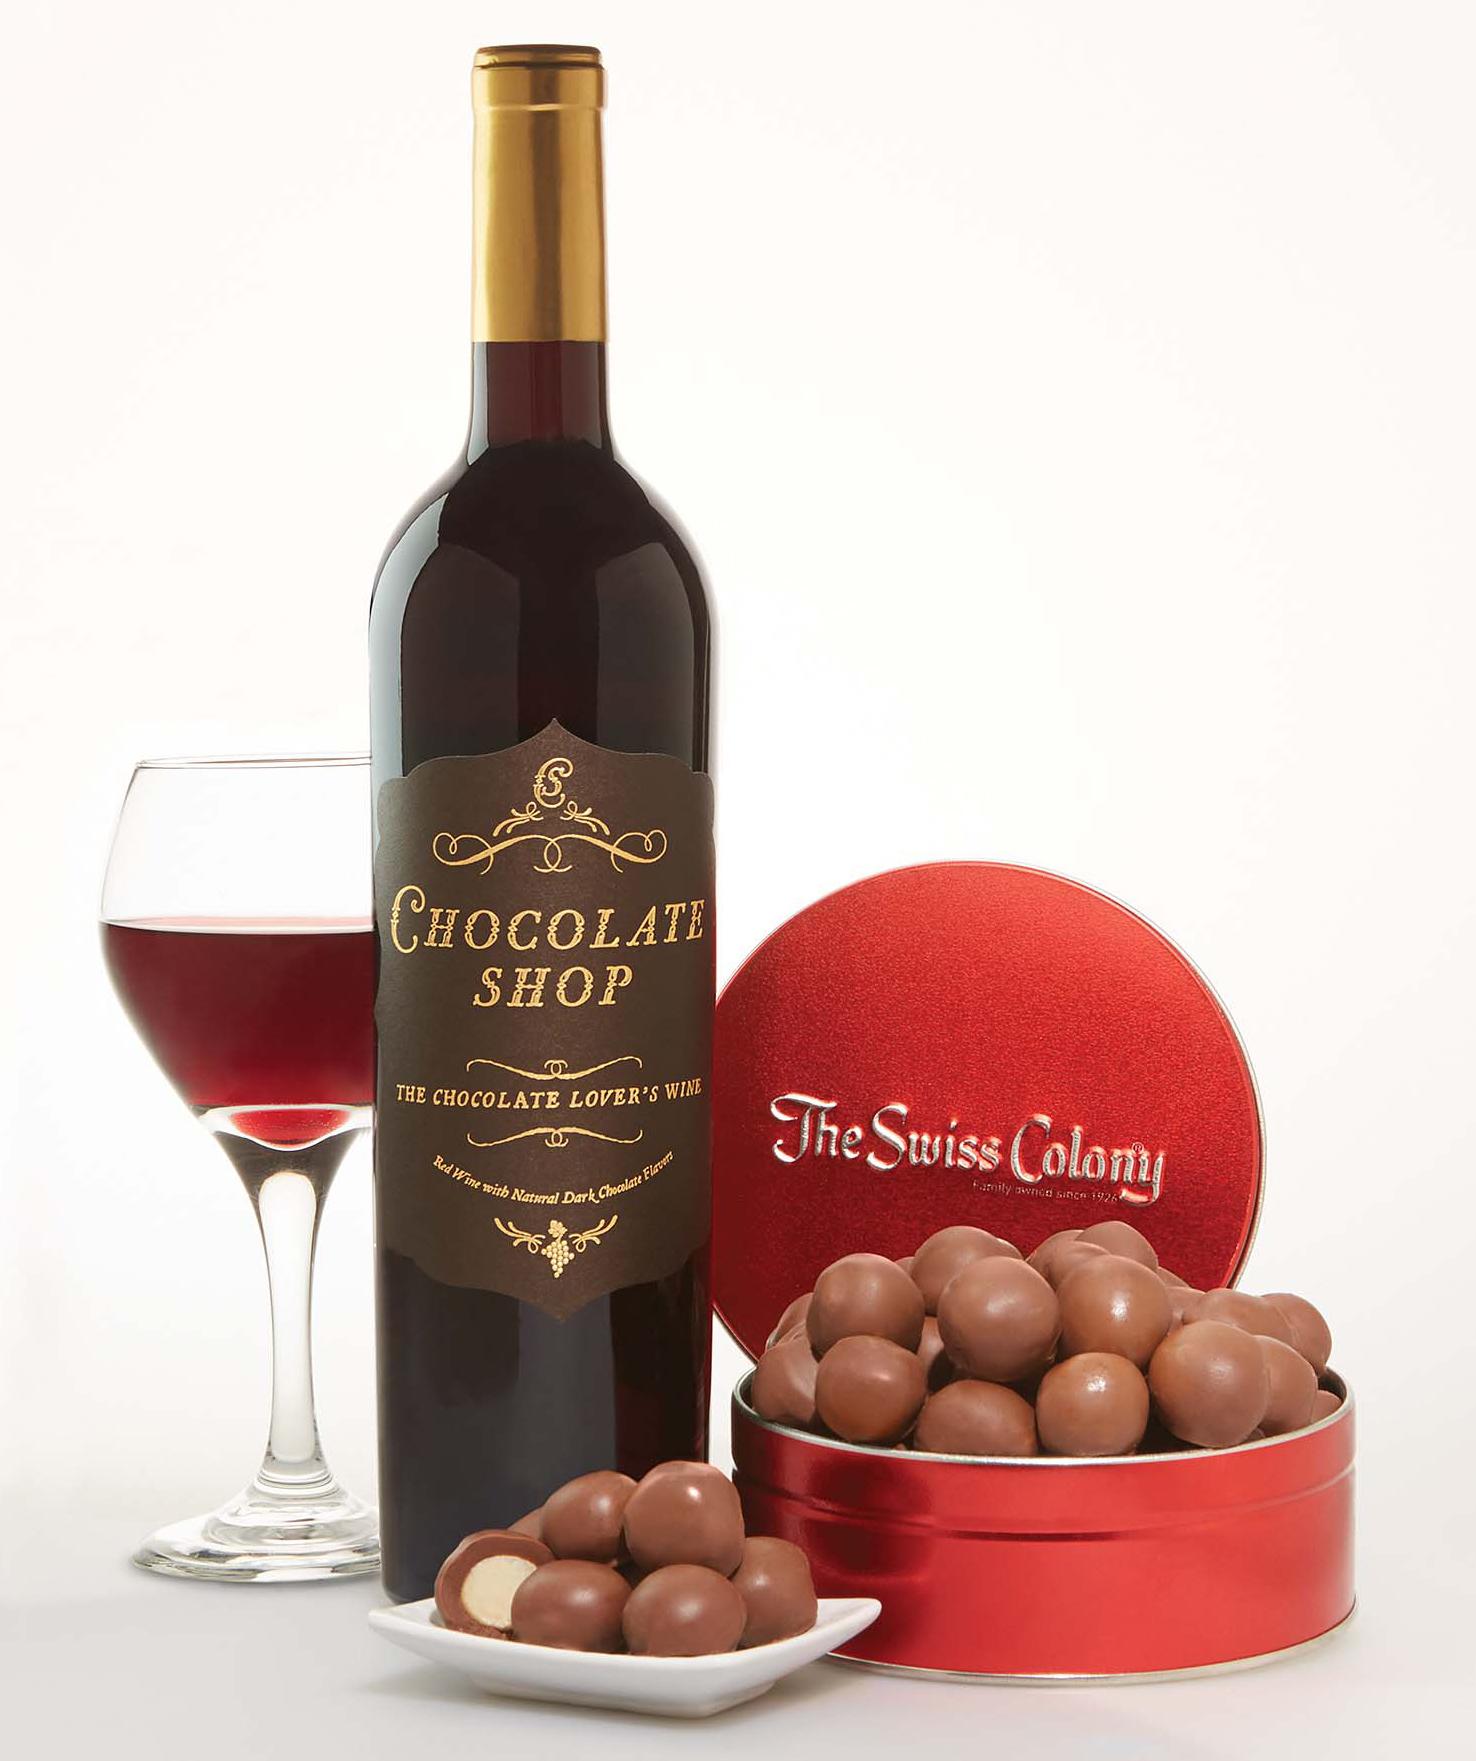 Chocolate With Wine - Pumpkin Chocolate Chip Cookies